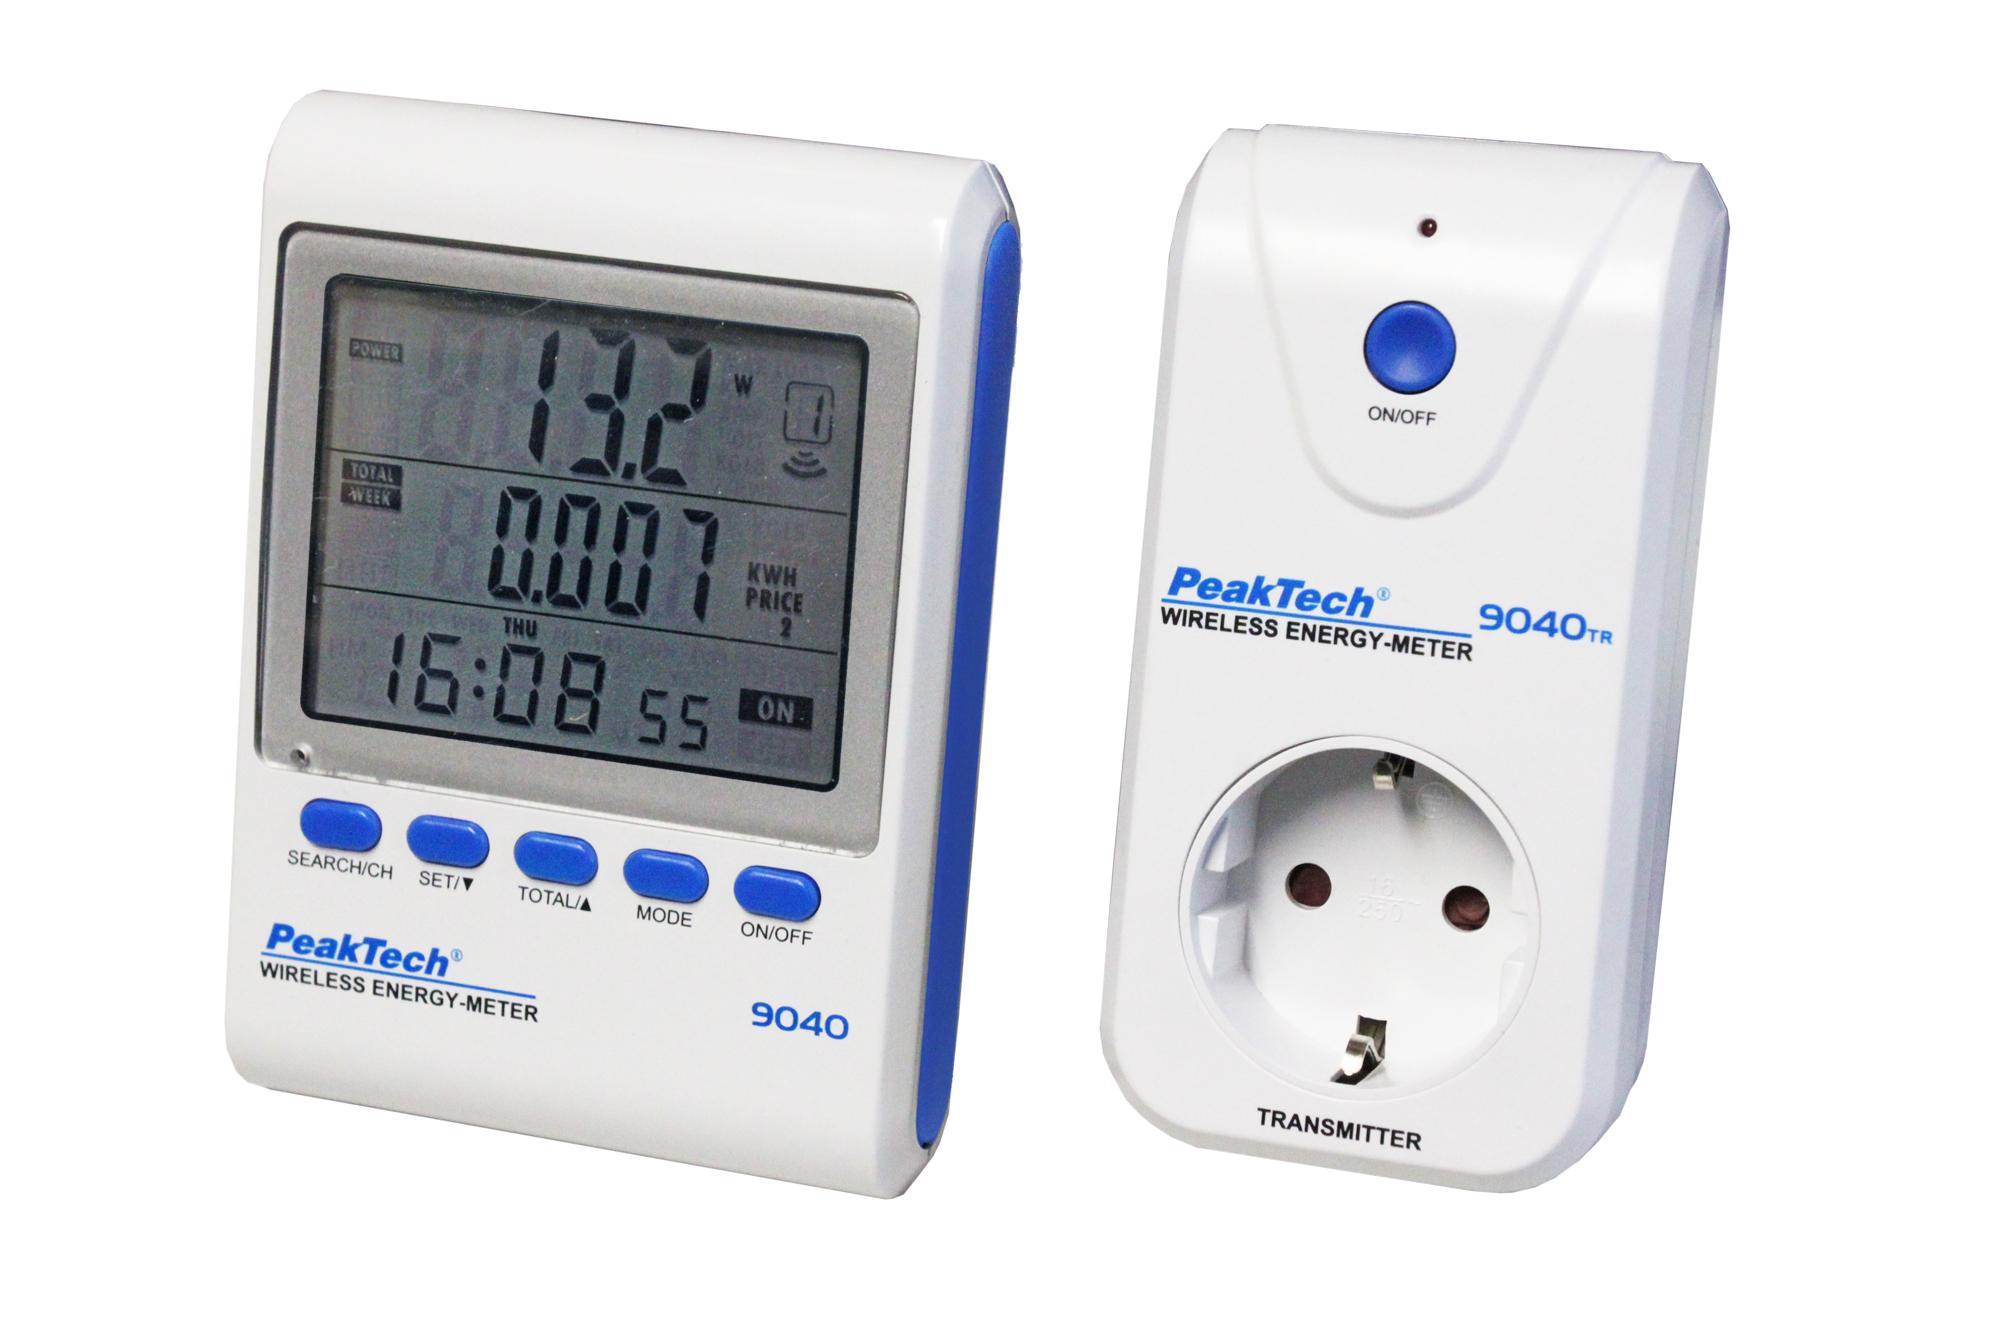 wireless energy meter